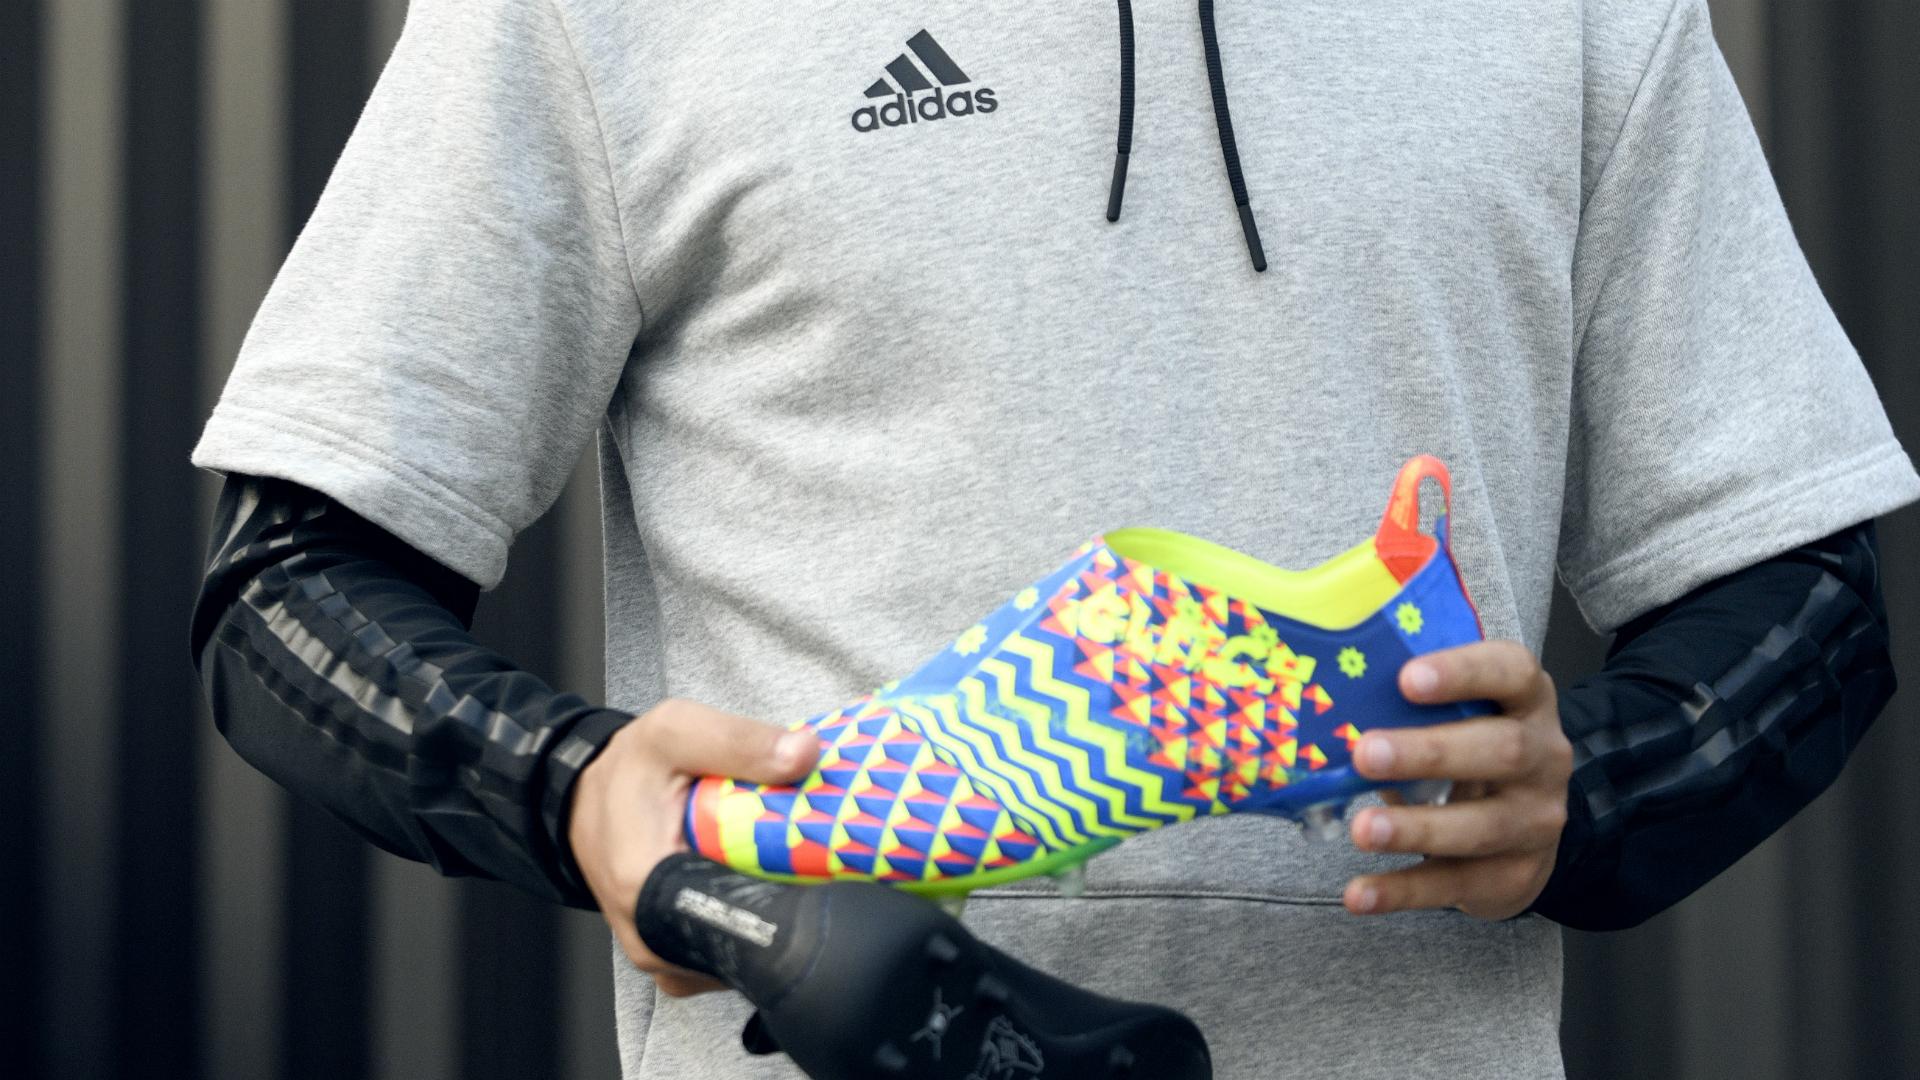 dybala shoes 2018